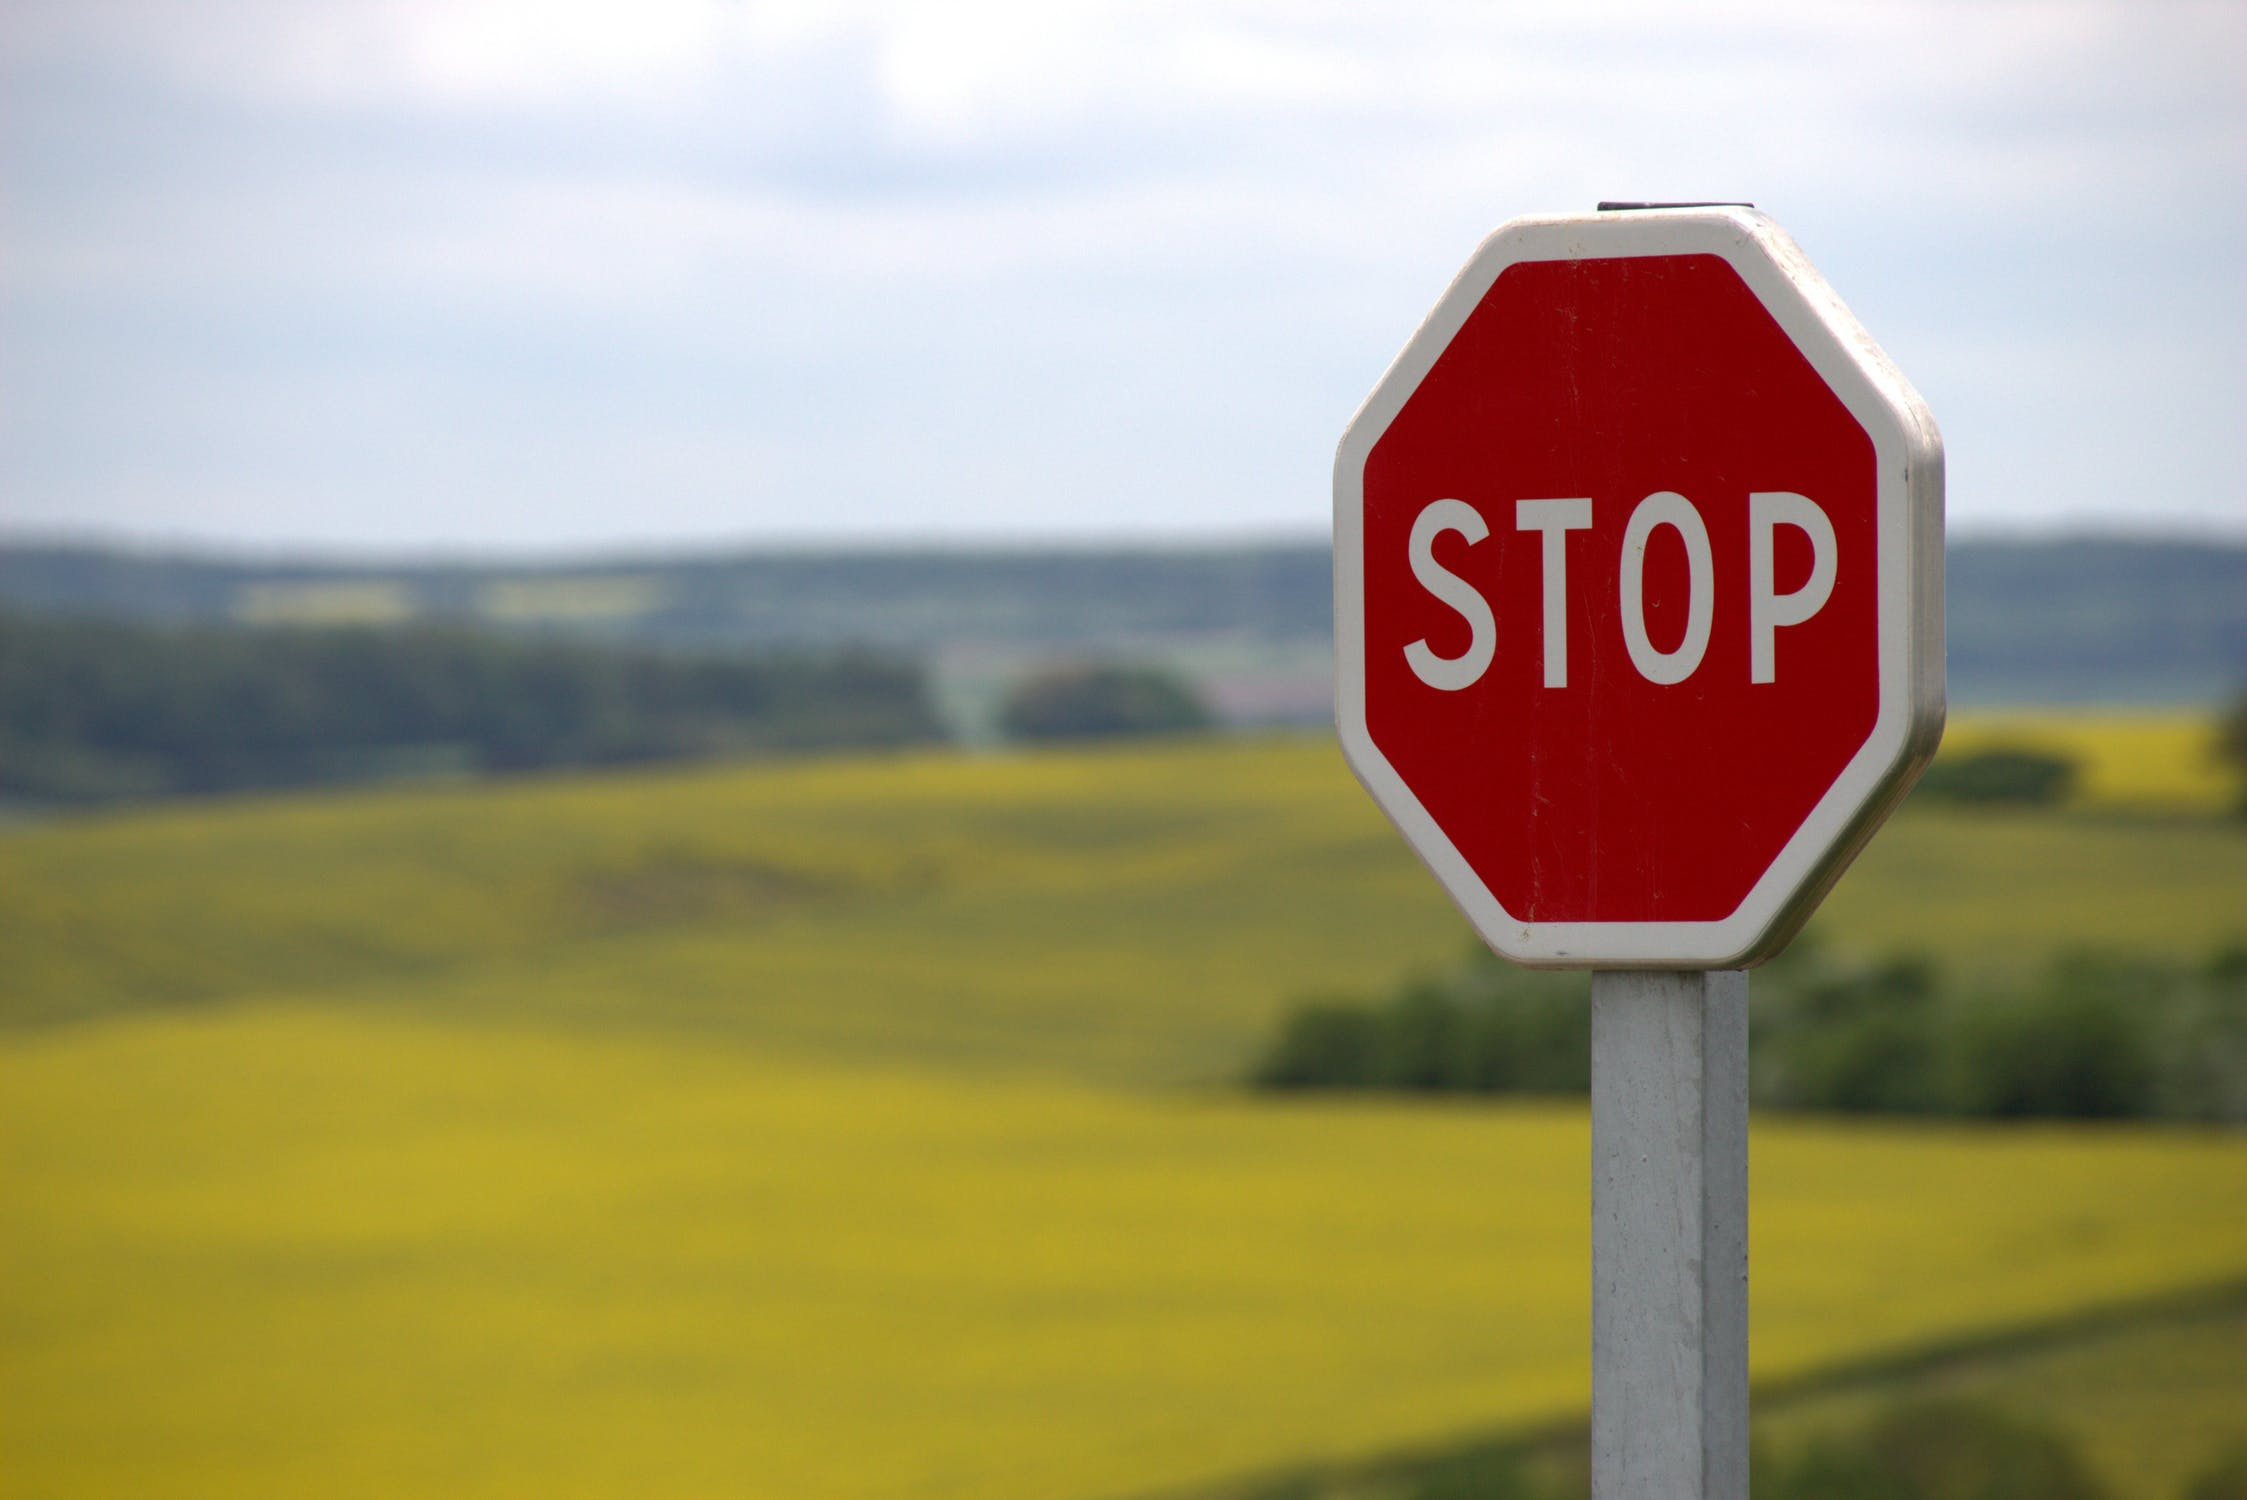 COVID-19 virus stops regulators Dead in their tracks